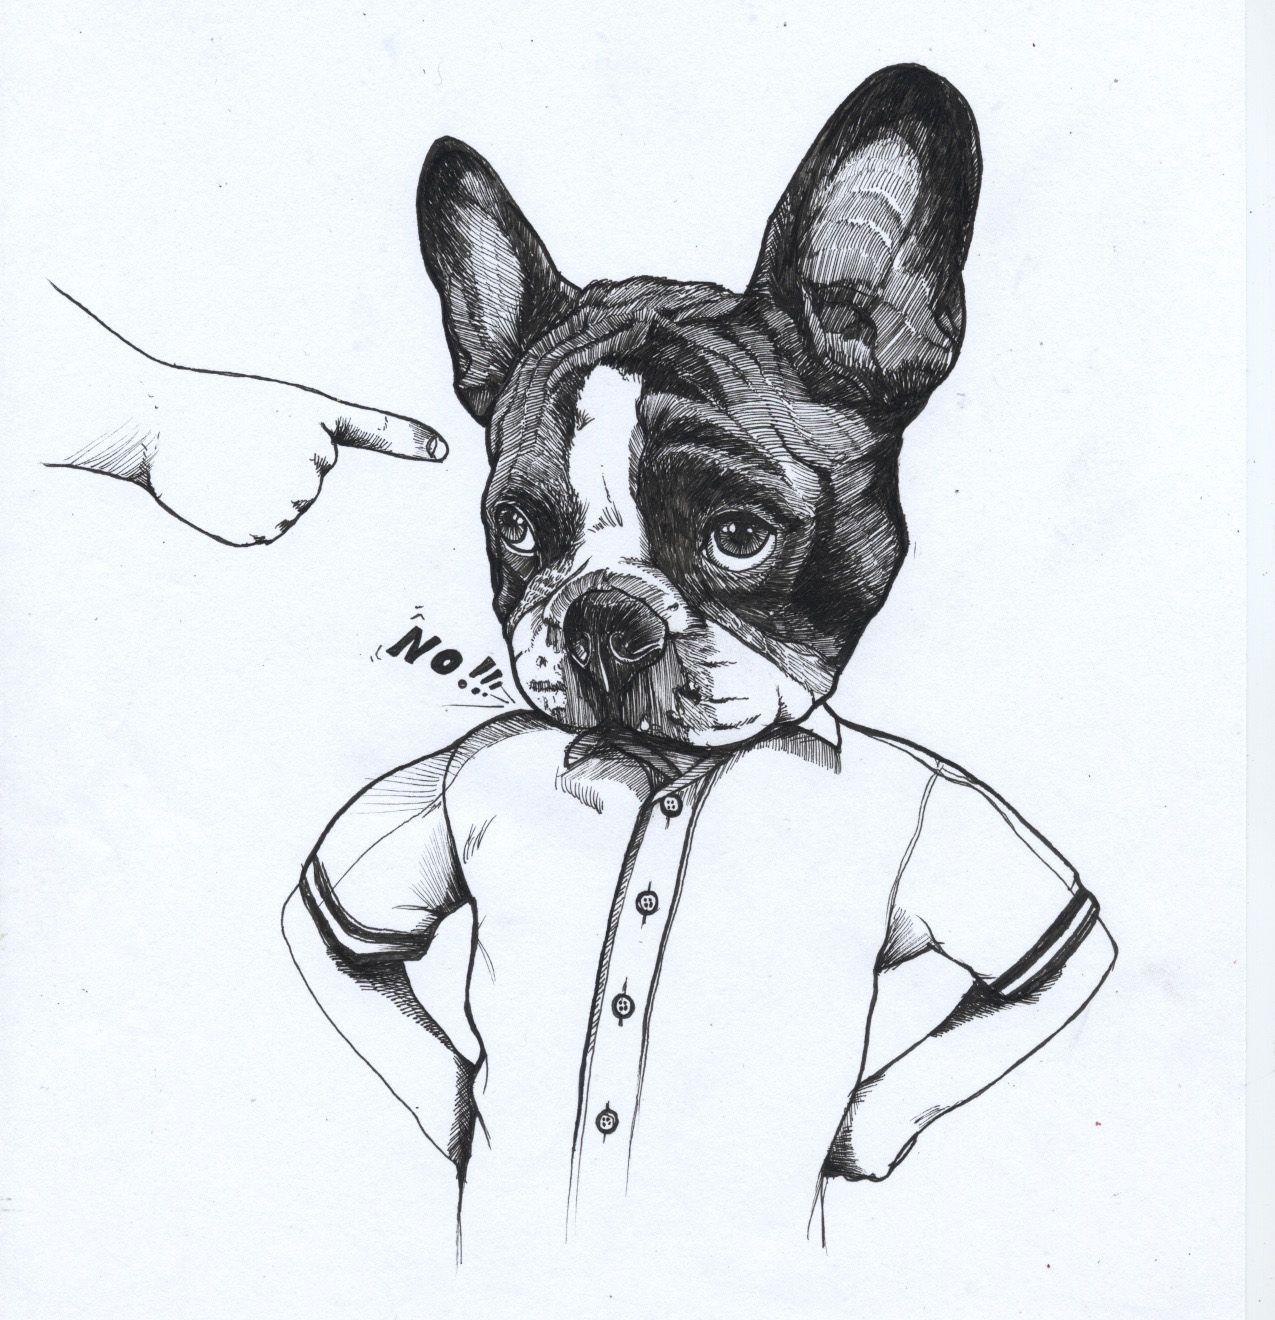 French Bulldog The Dog Painter Jeroen Teunen Teunen Frenchie Dieren Franse Bulldog Bulldog